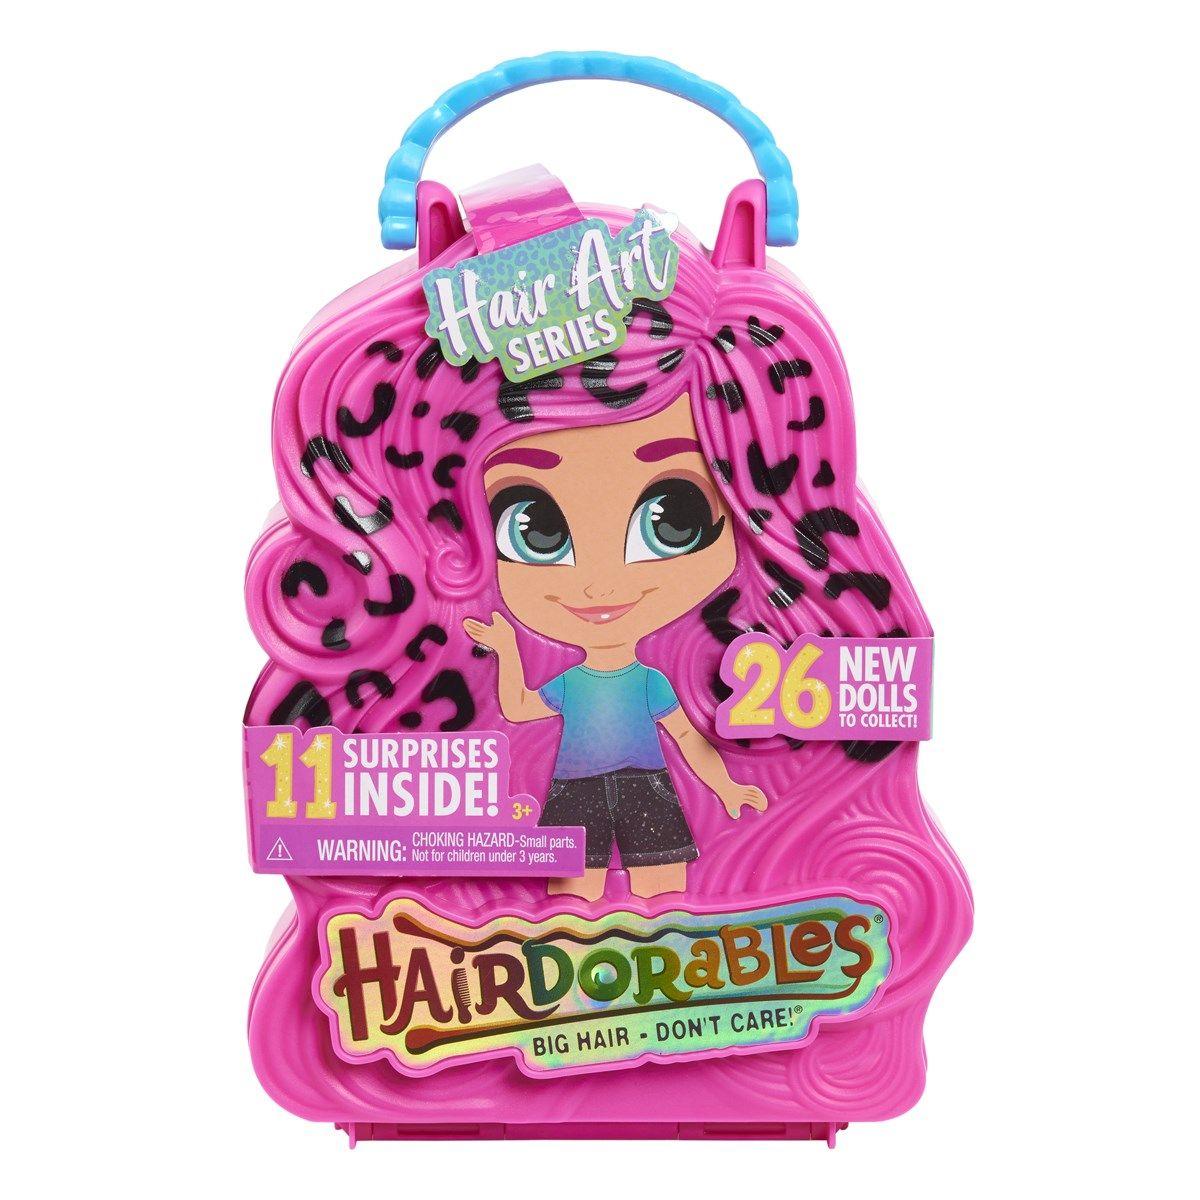 Hairdorables - Doll Series 5 (903-23850)